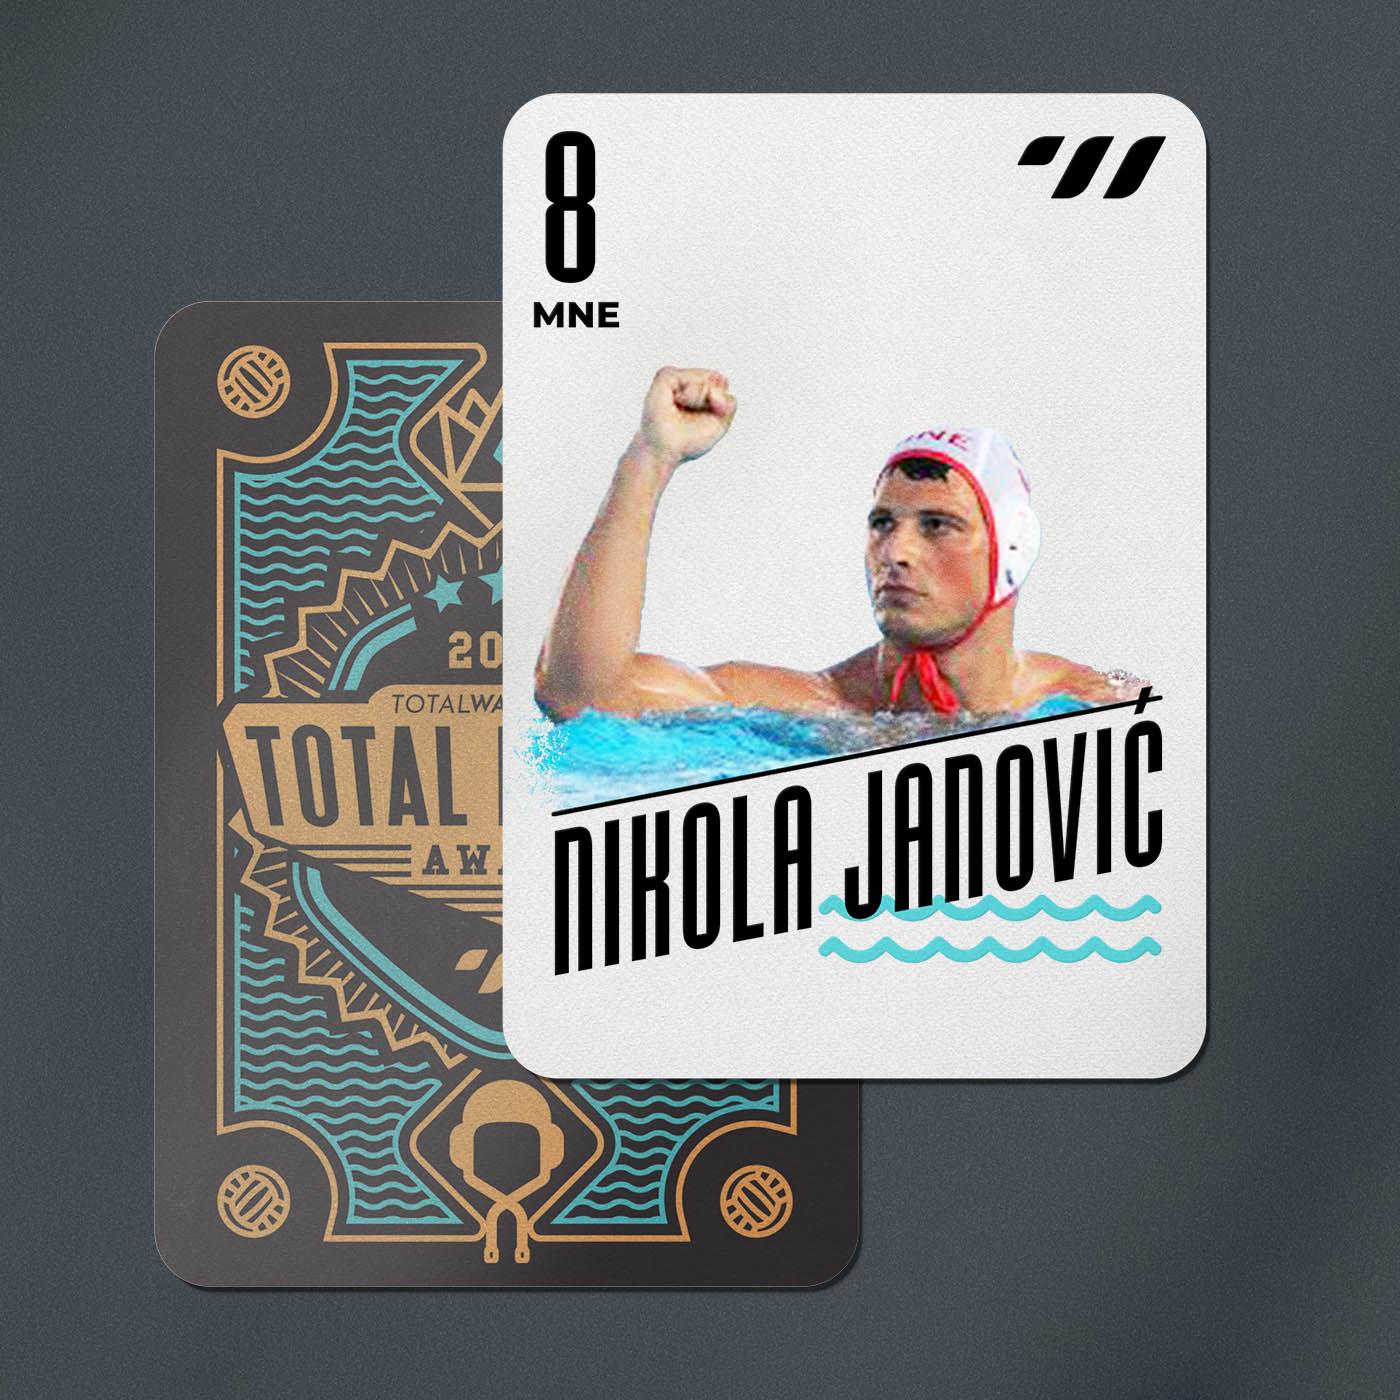 LEFT SIDE - Nikola Janovic (MNE)